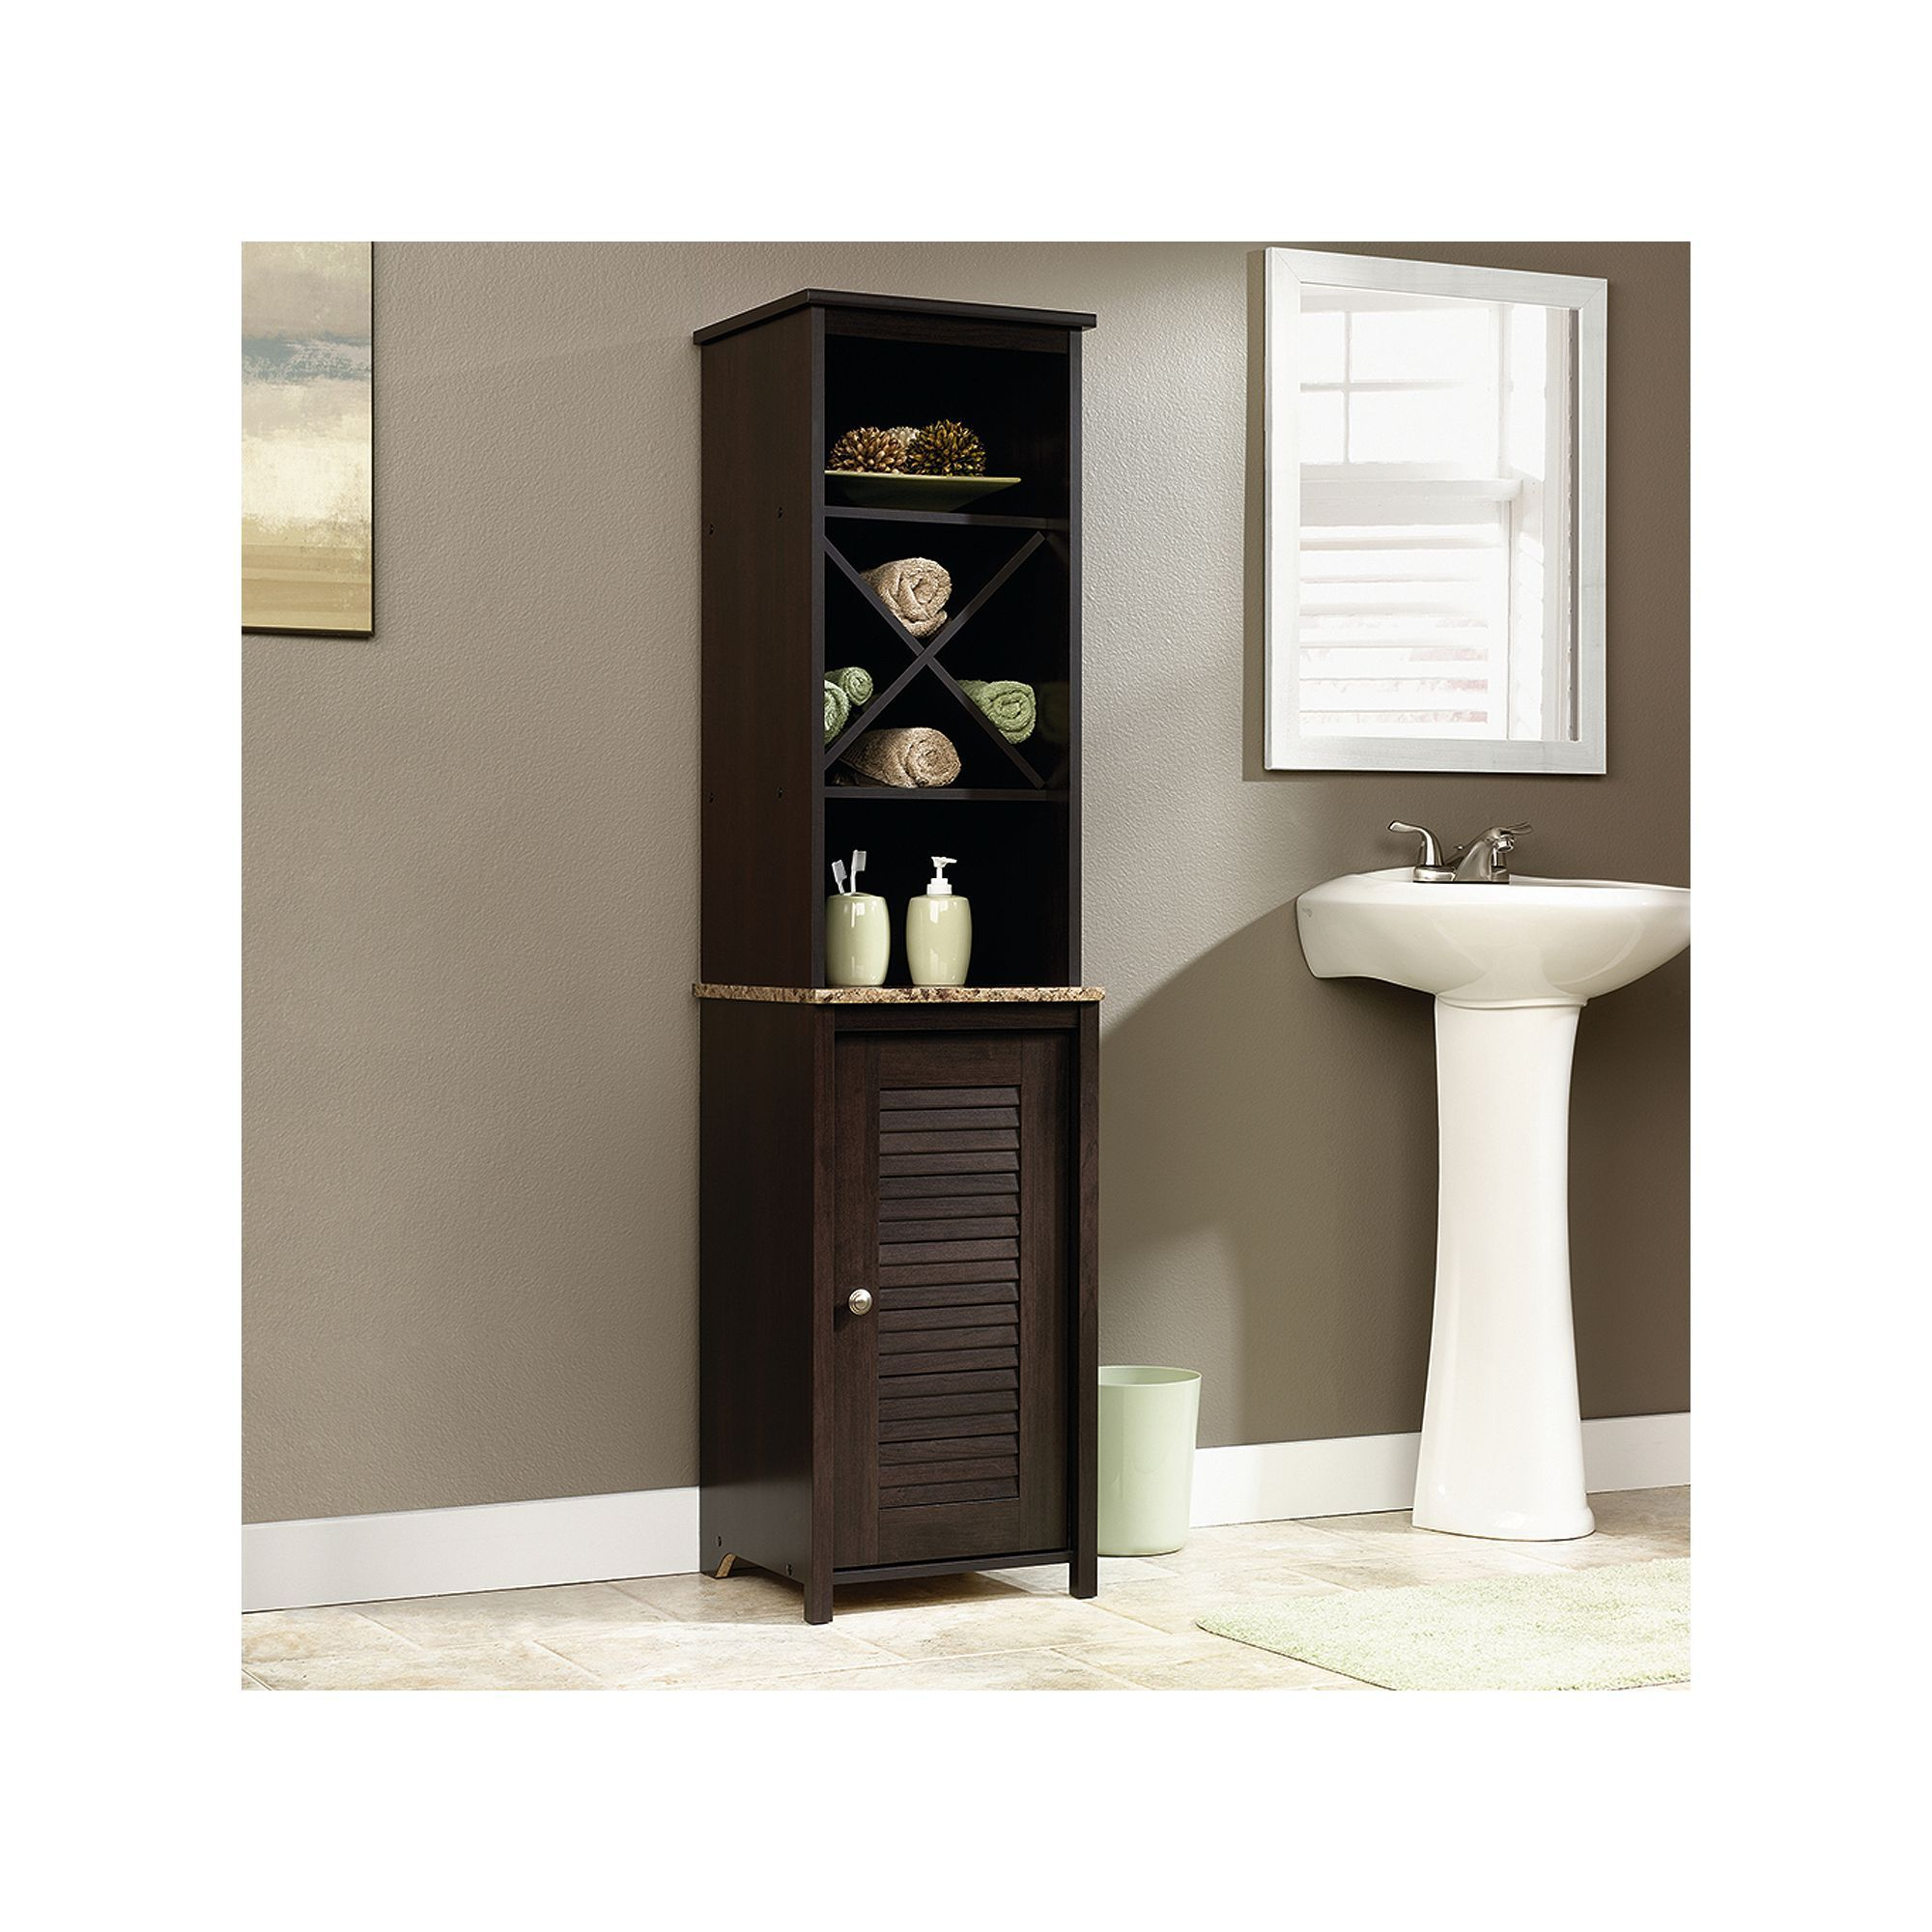 Sauder Peppercorn Linen Tower Bathroom Furniture Linen Cabinet Linen Storage Cabinet